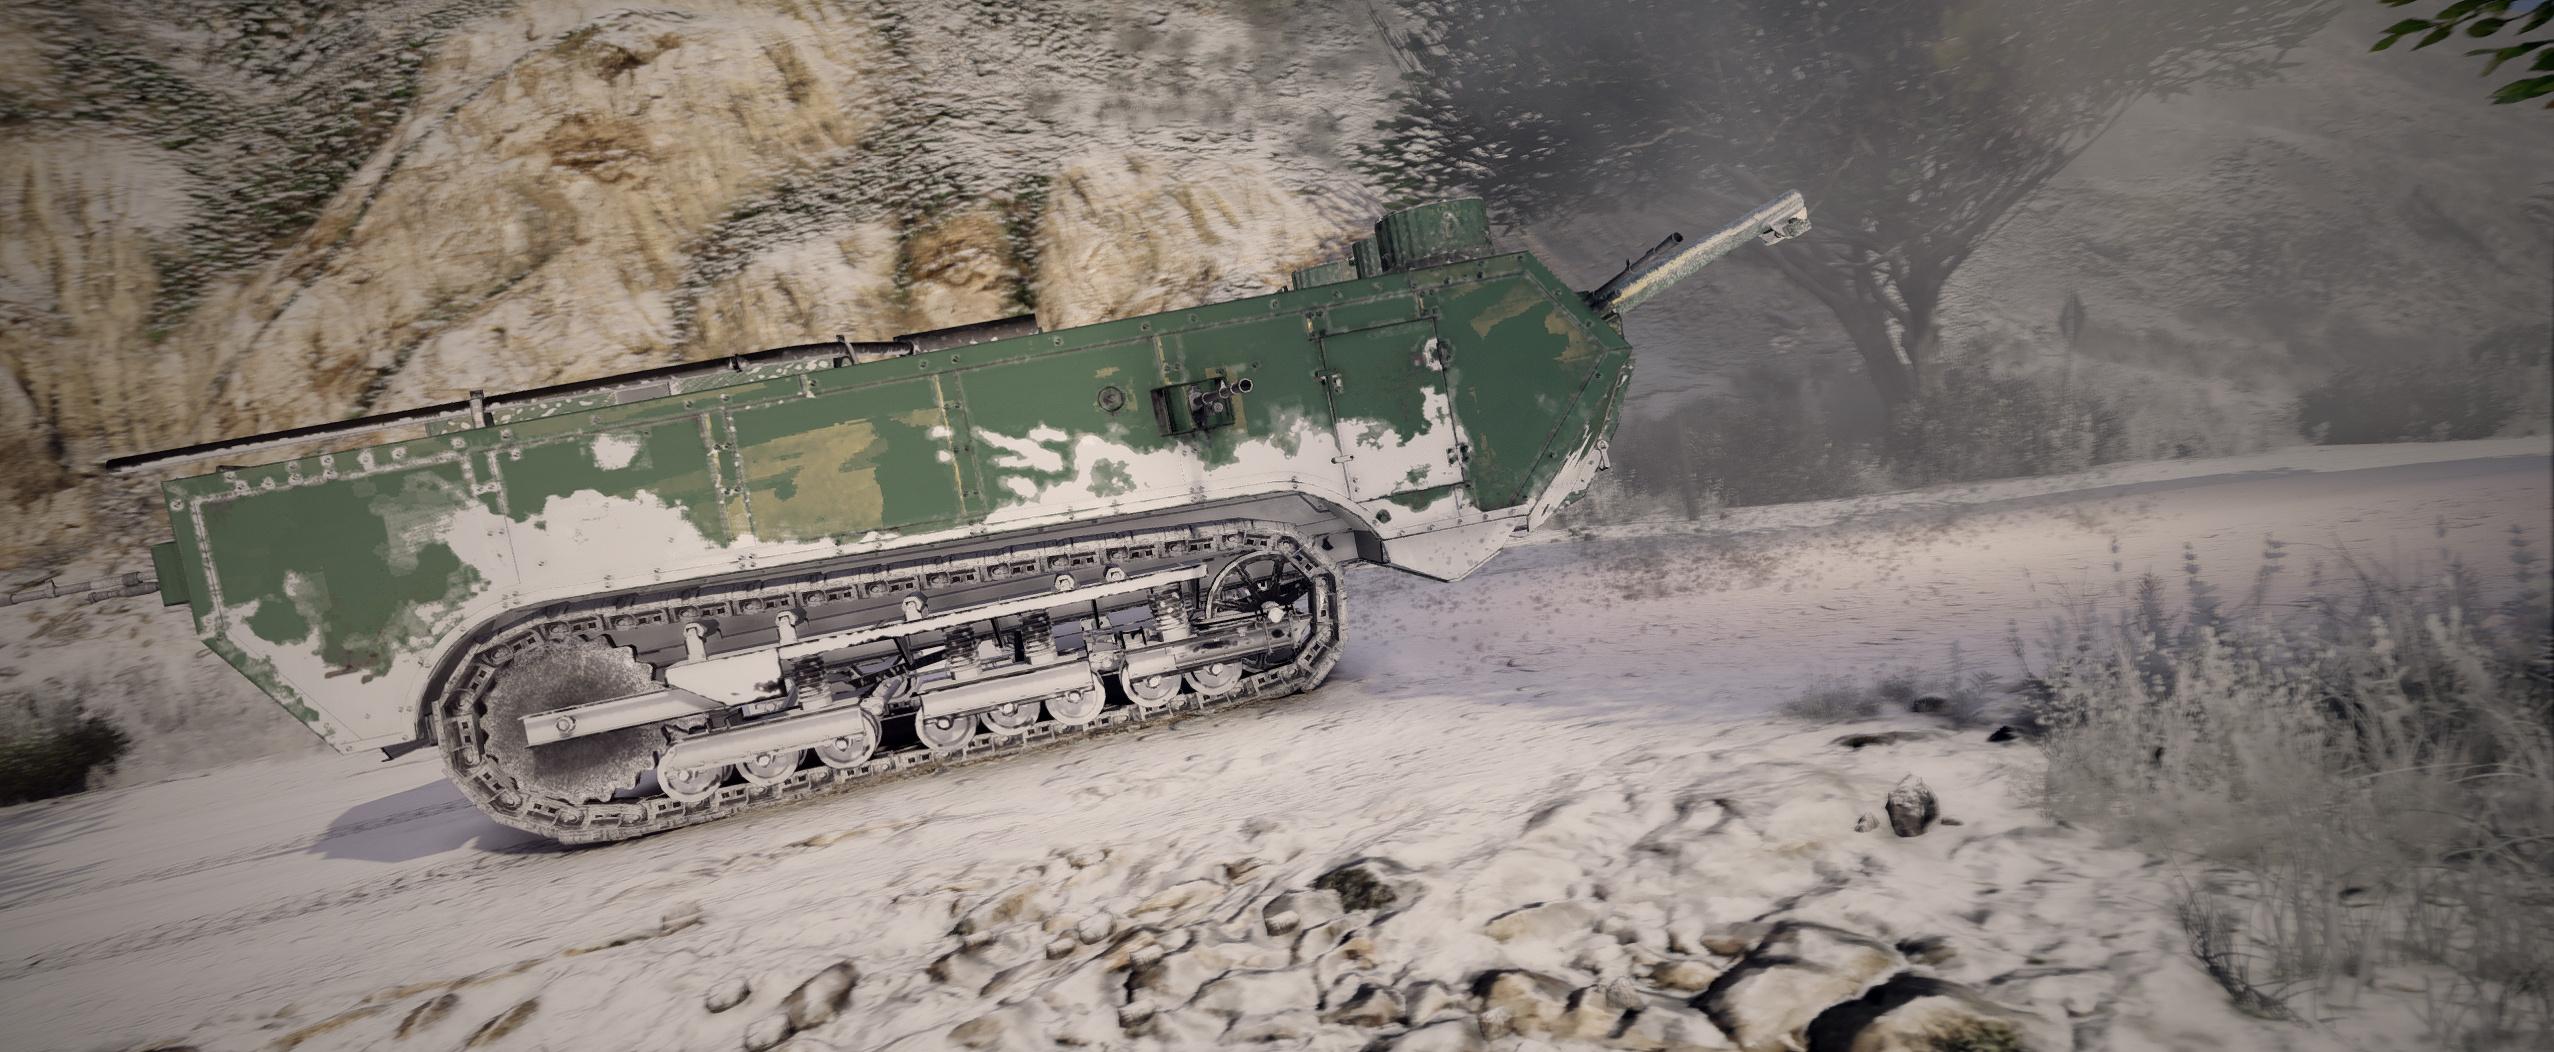 Battlefield 1 Tanks [Add-On] - GTA5-Mods com